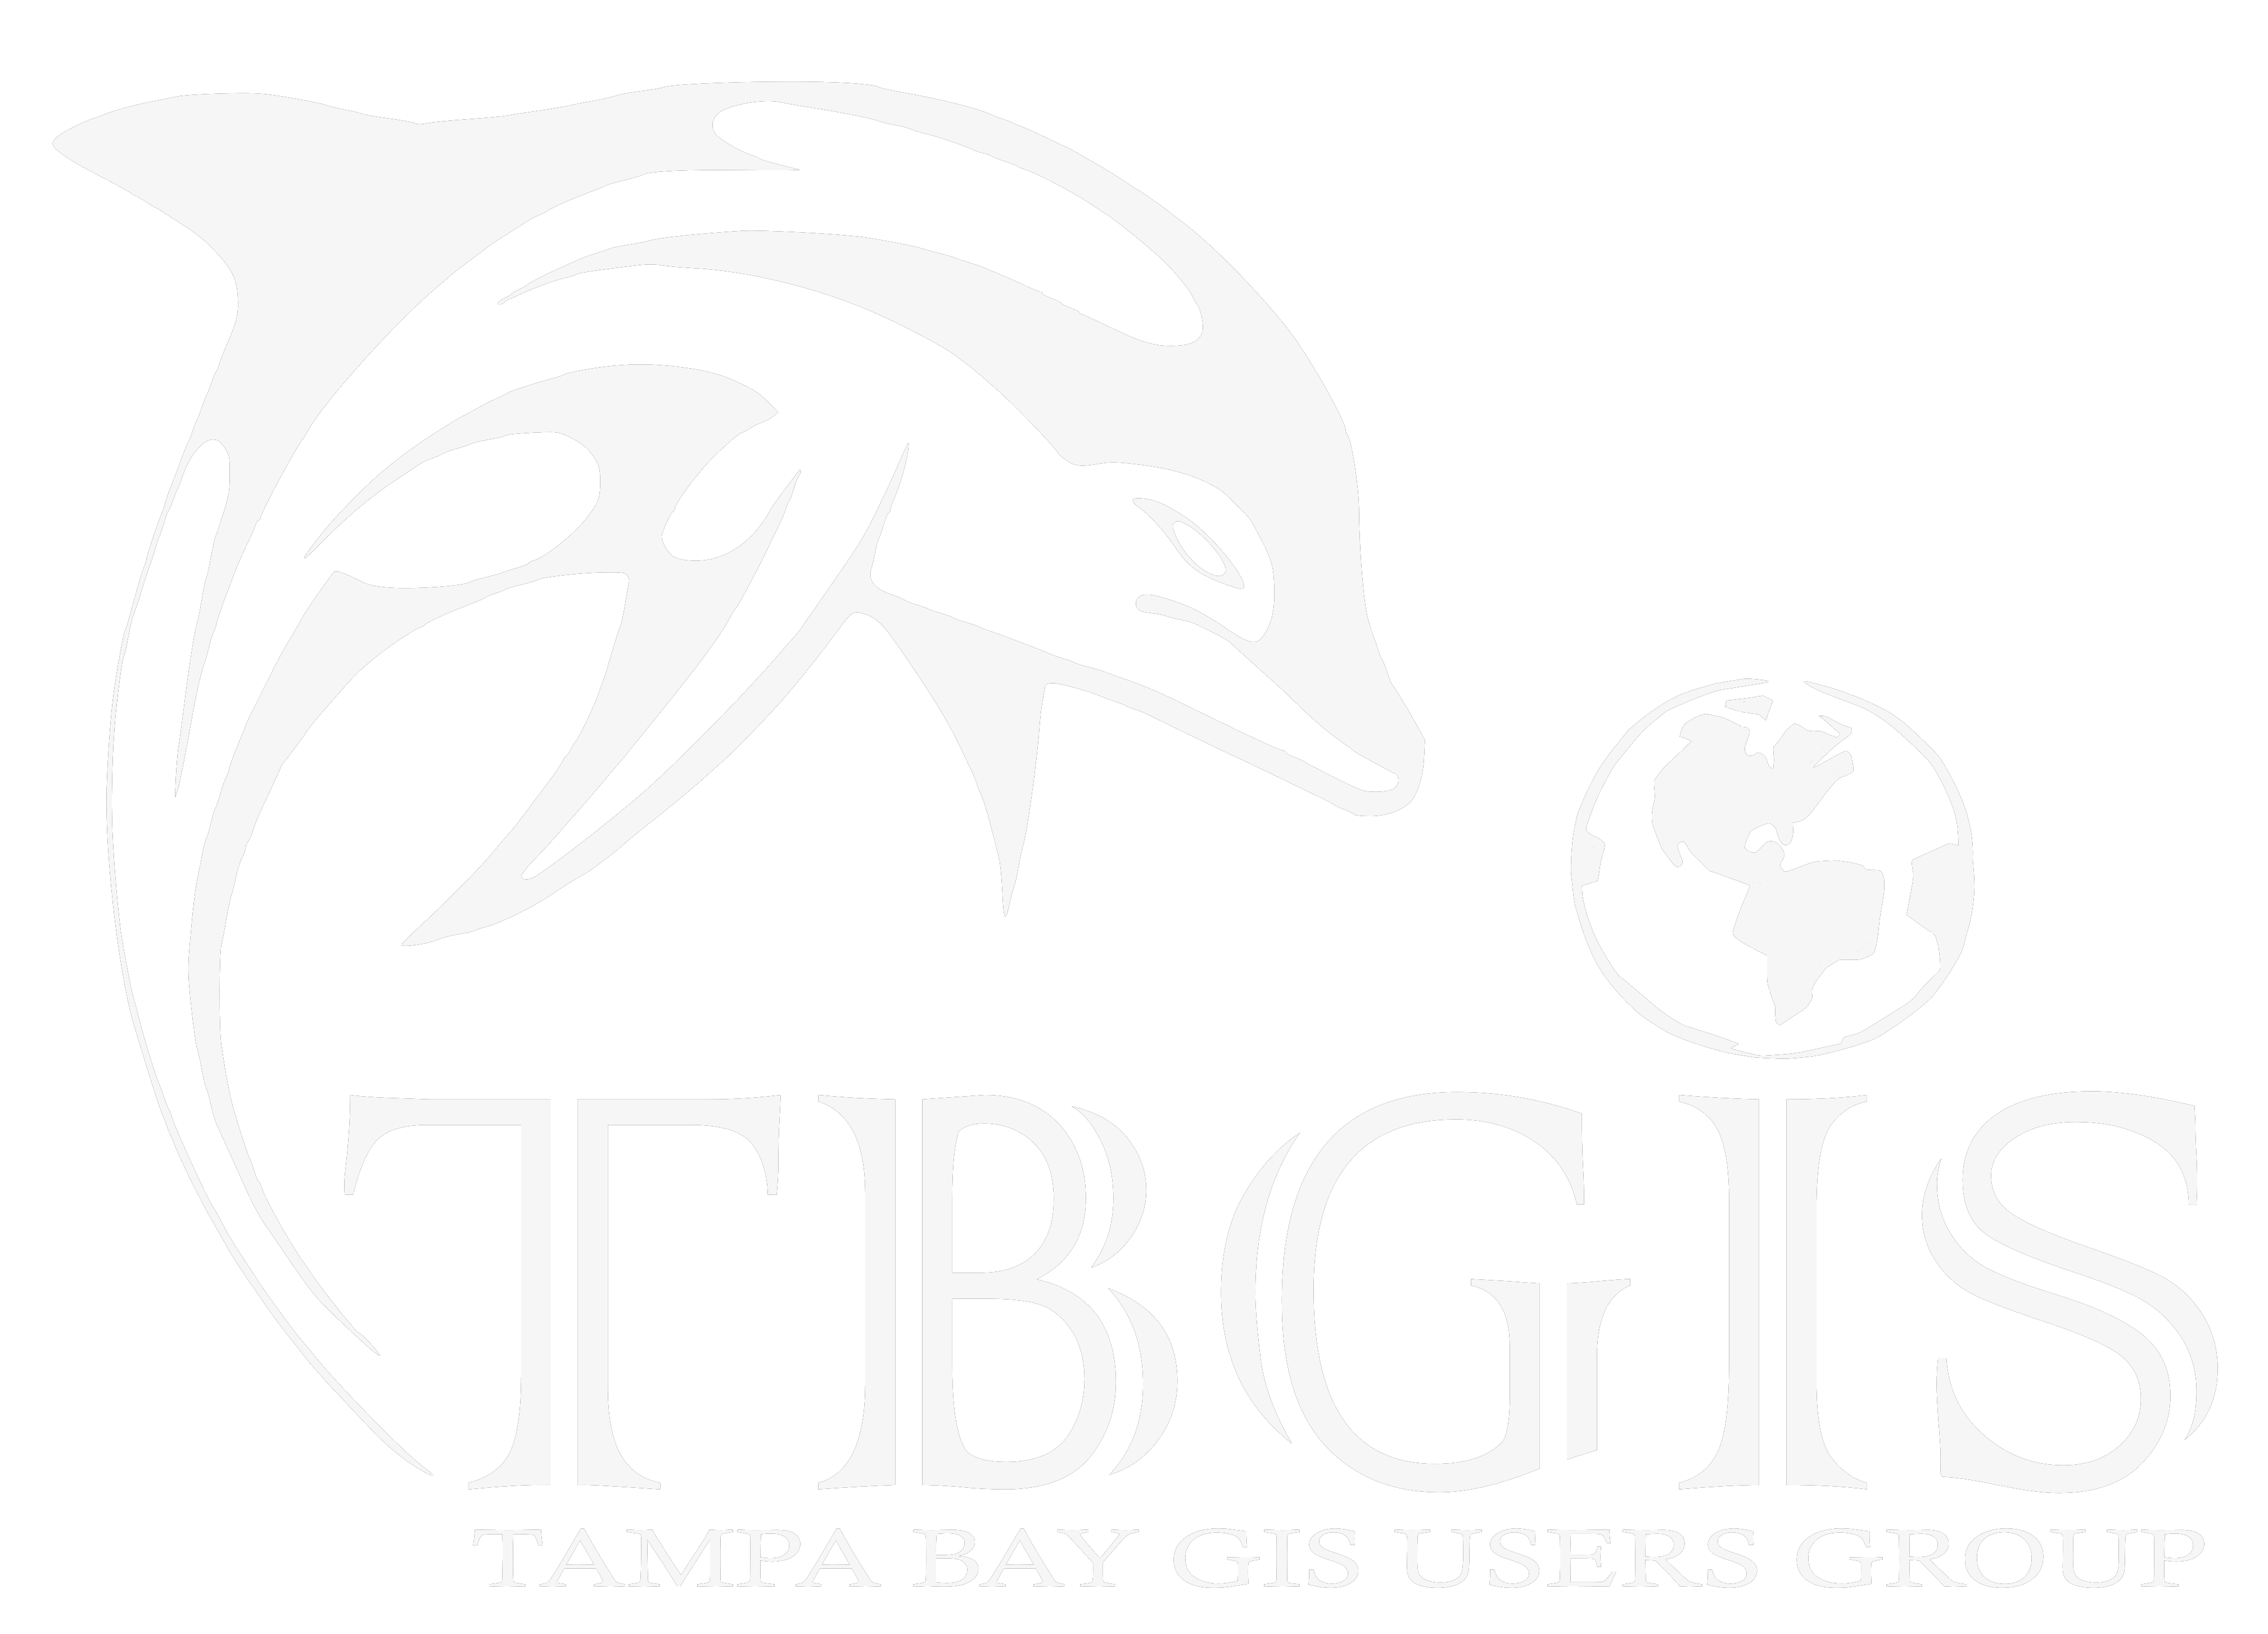 TBGIS